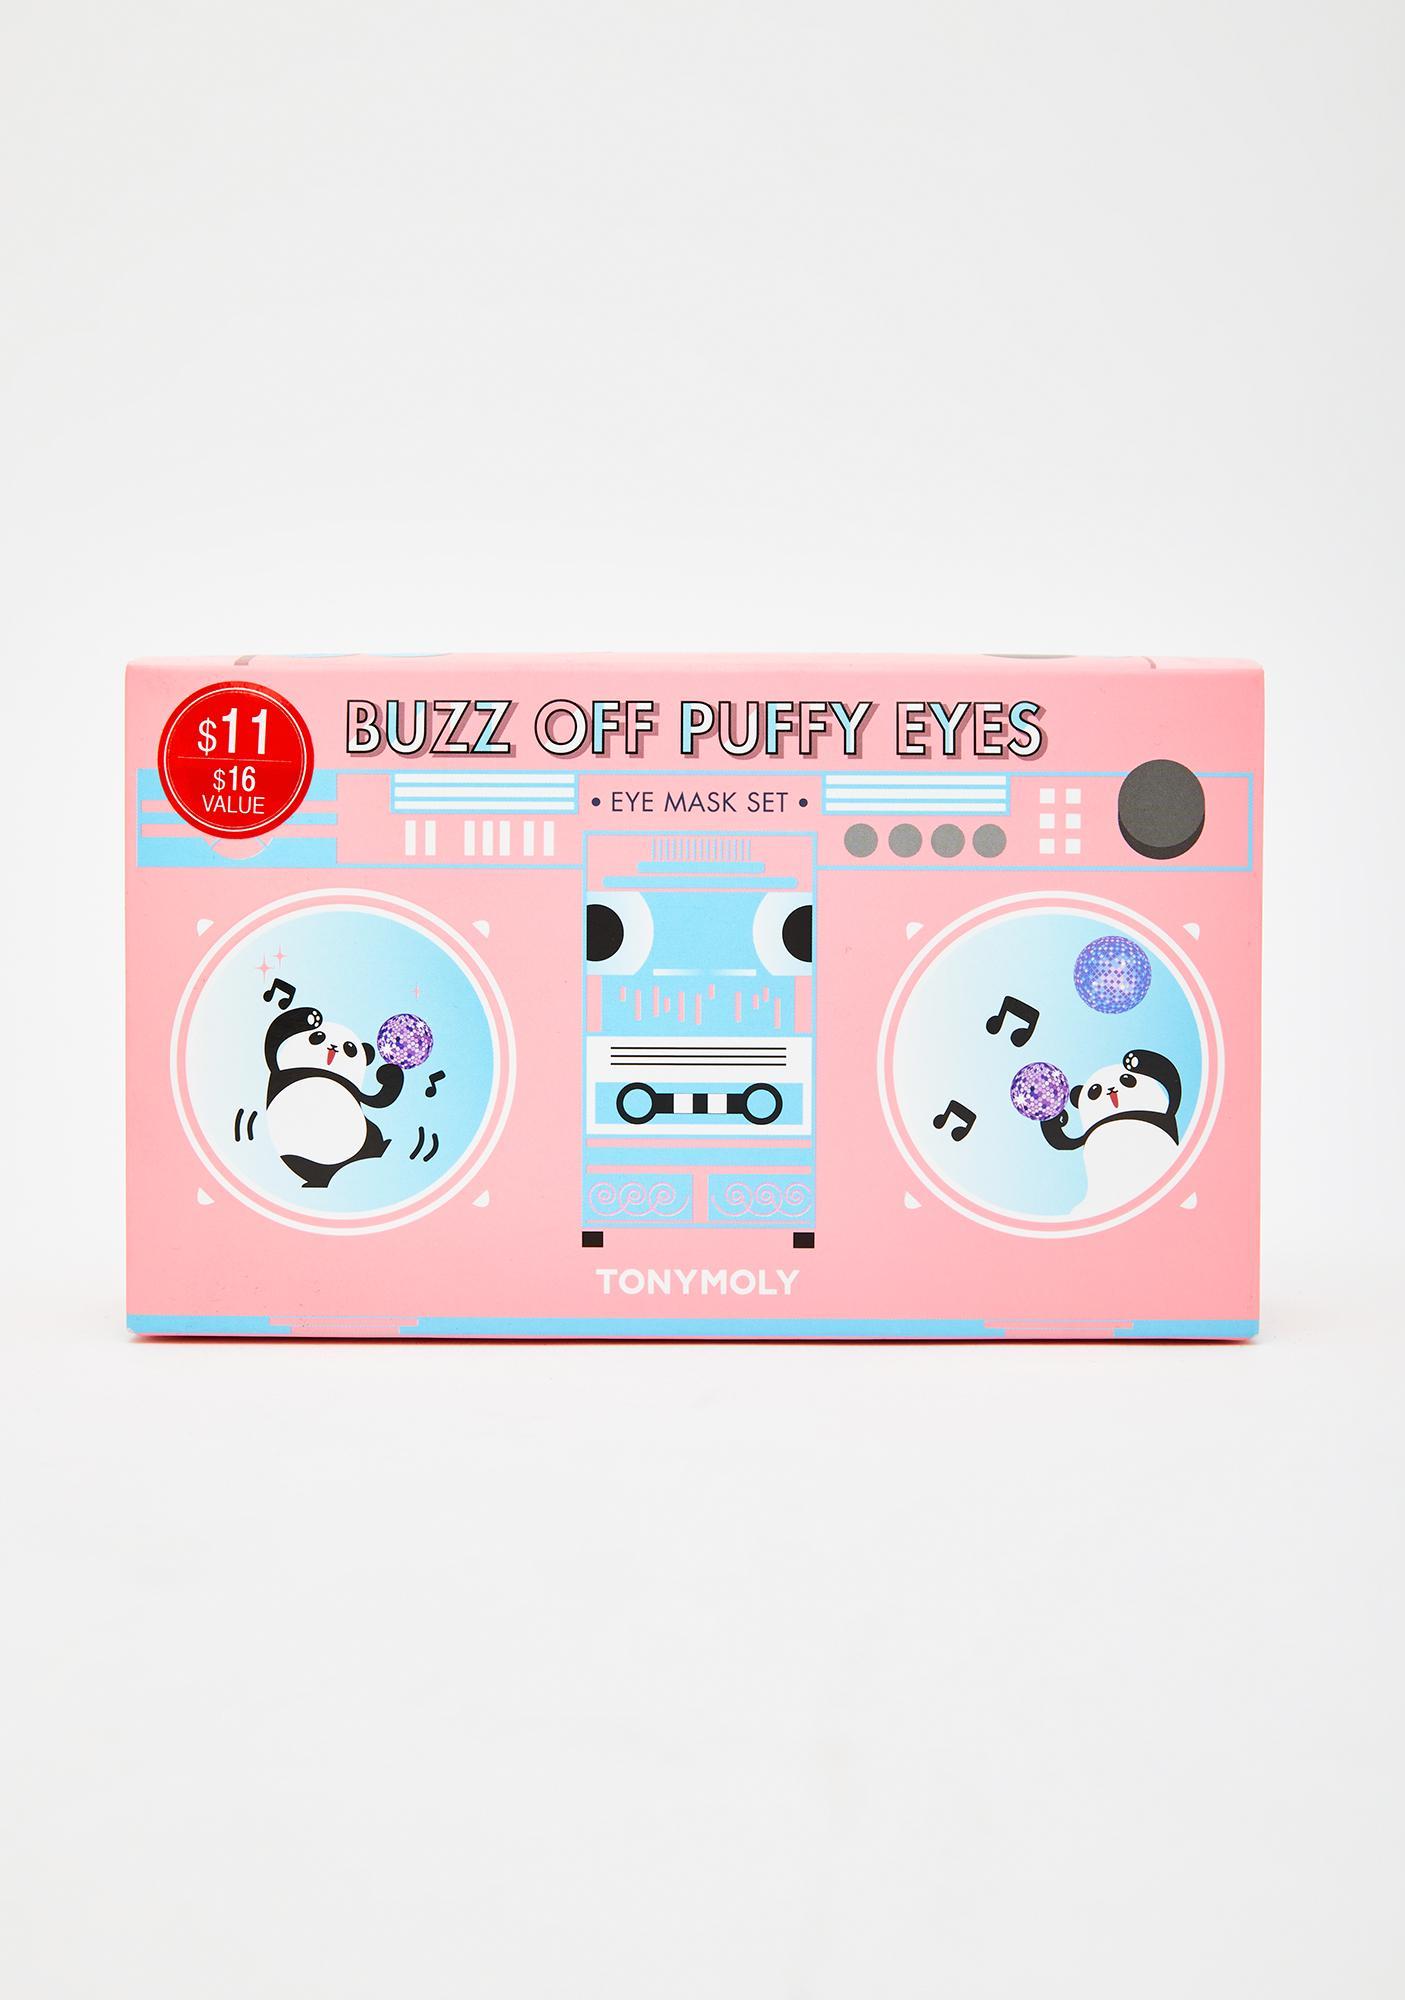 TONYMOLY Buzz Off Puffy Eyes Eye Mask Set Of 4